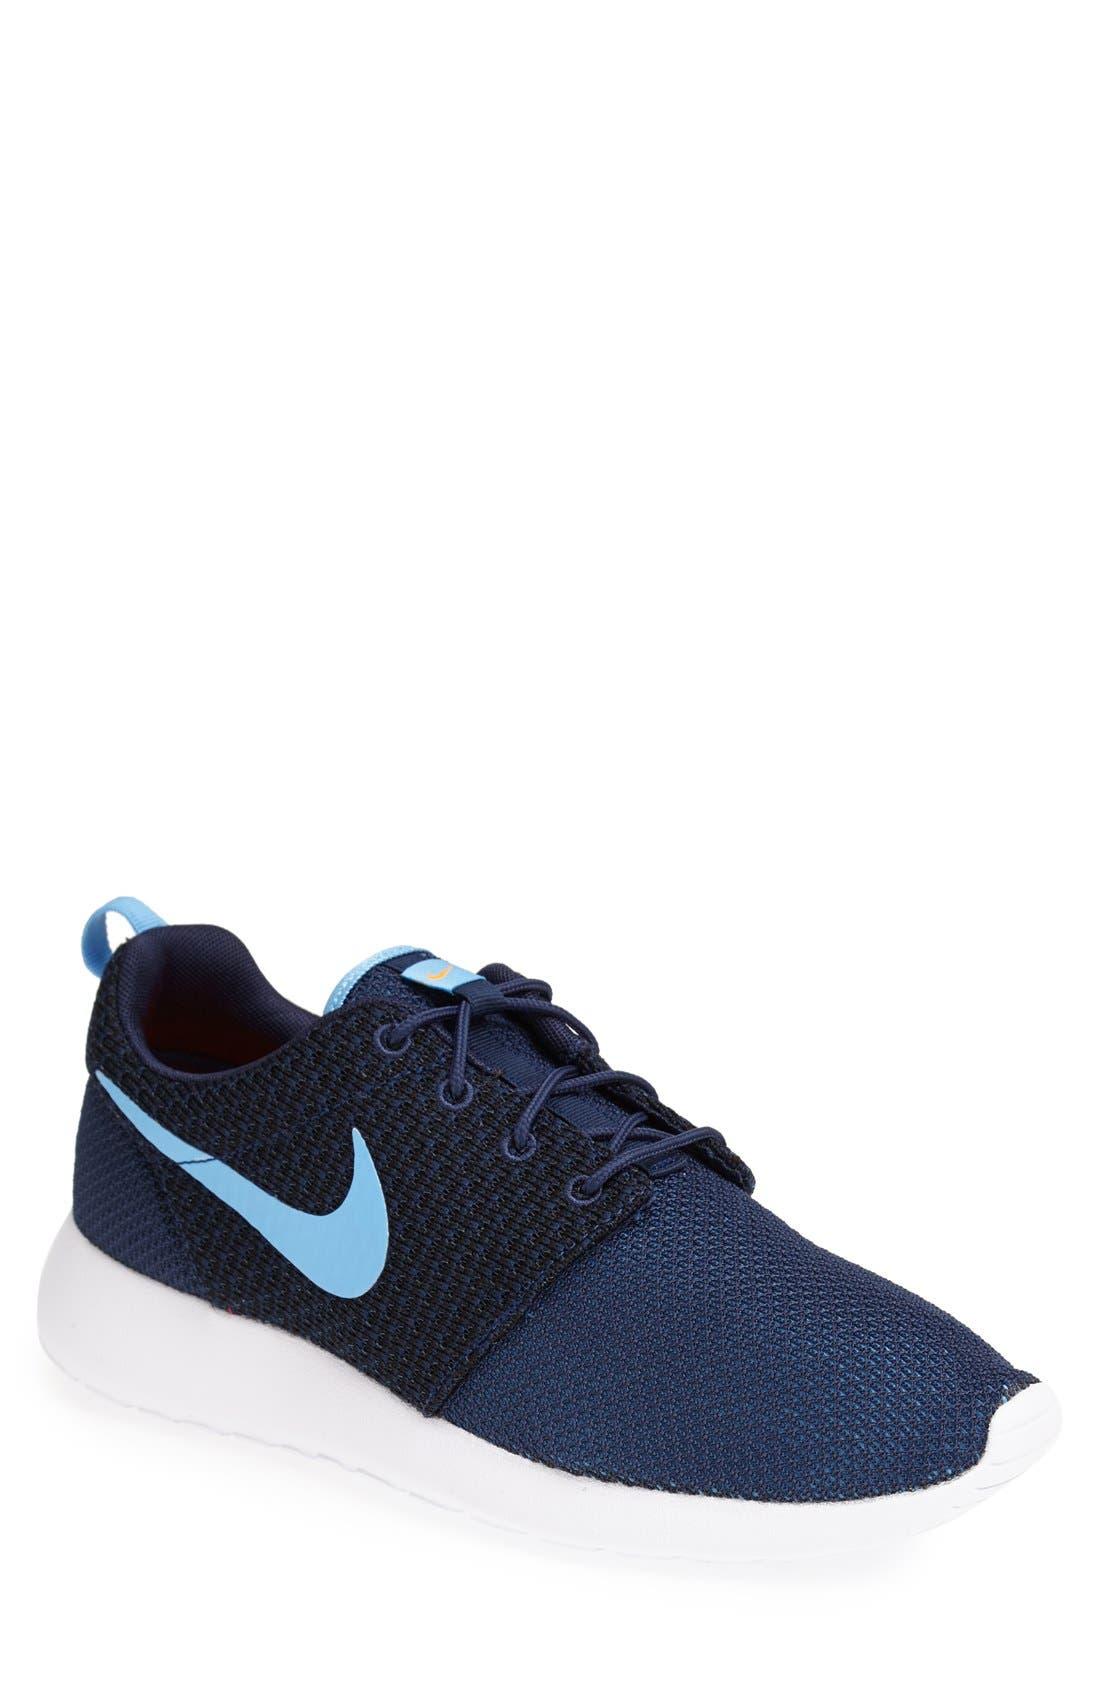 ,                             'Roshe Run' Sneaker,                             Main thumbnail 115, color,                             418